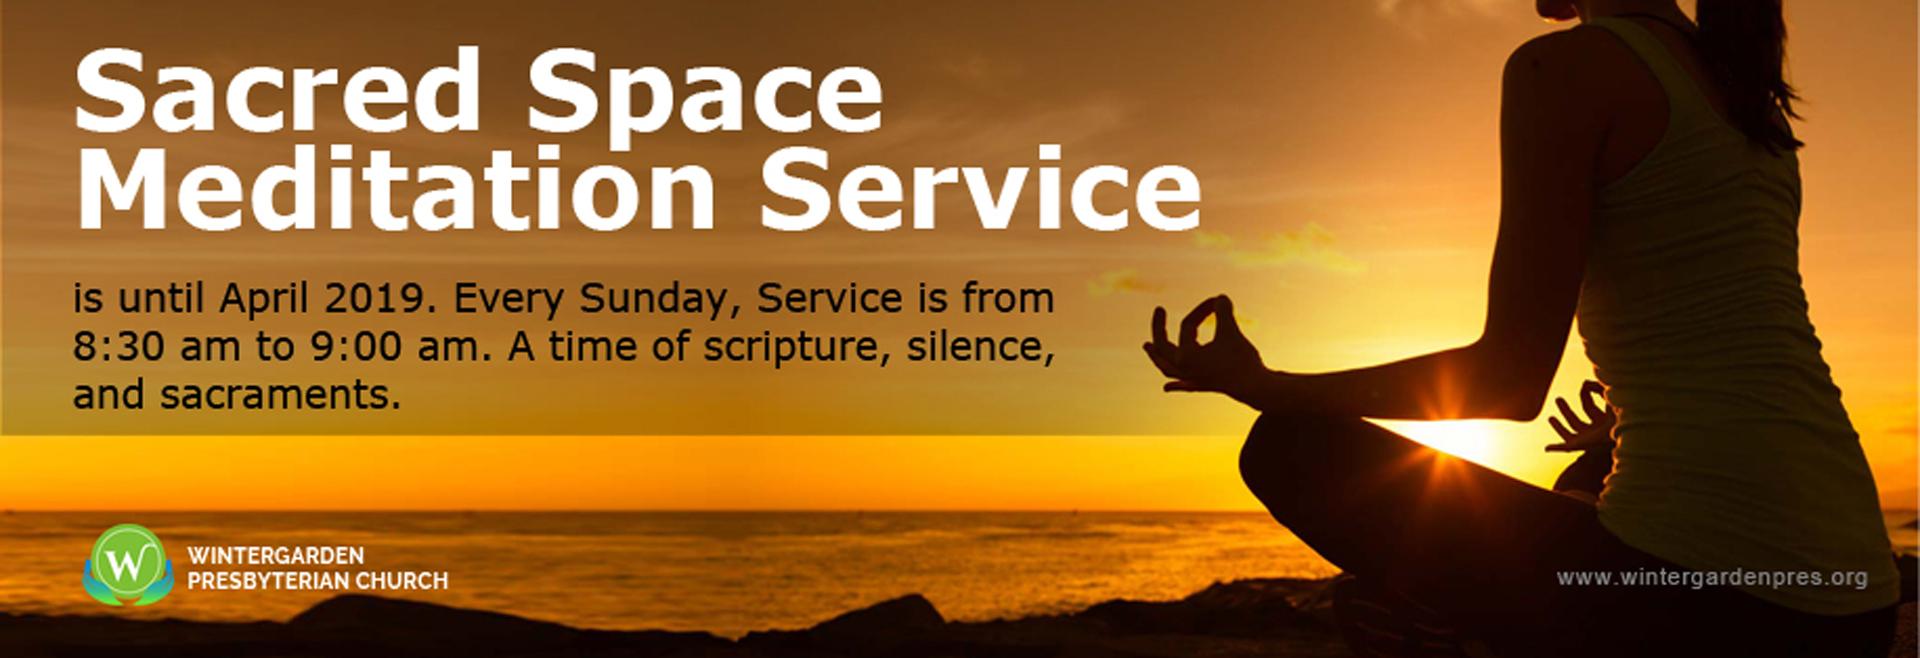 SacredSpace-Banner